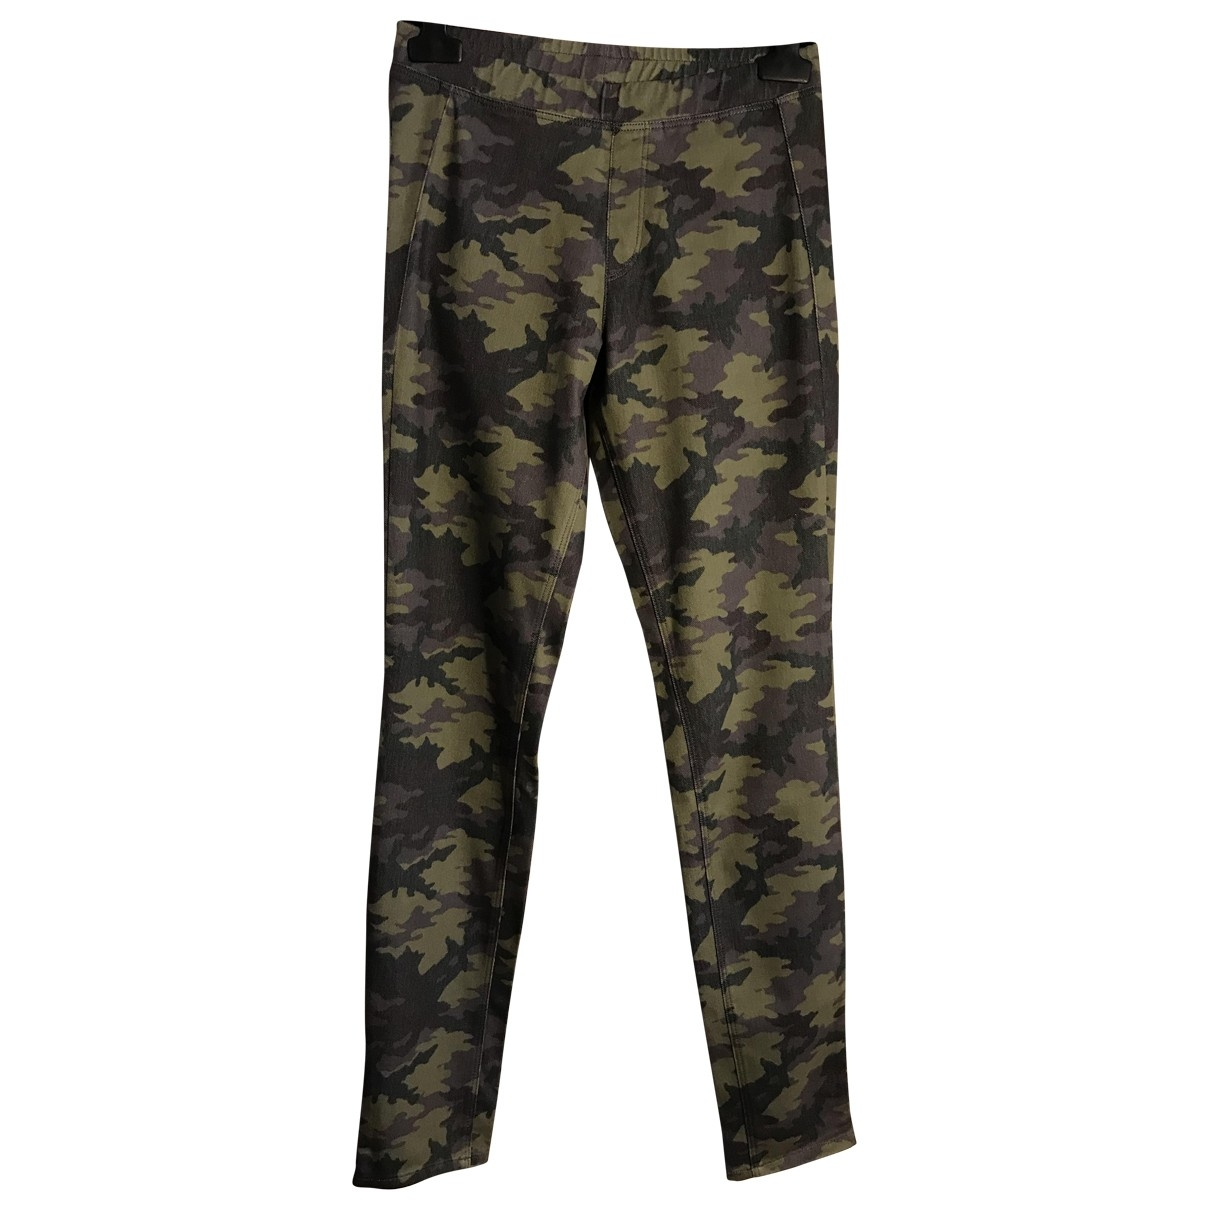 Uniqlo \N Khaki Trousers for Women 36 FR